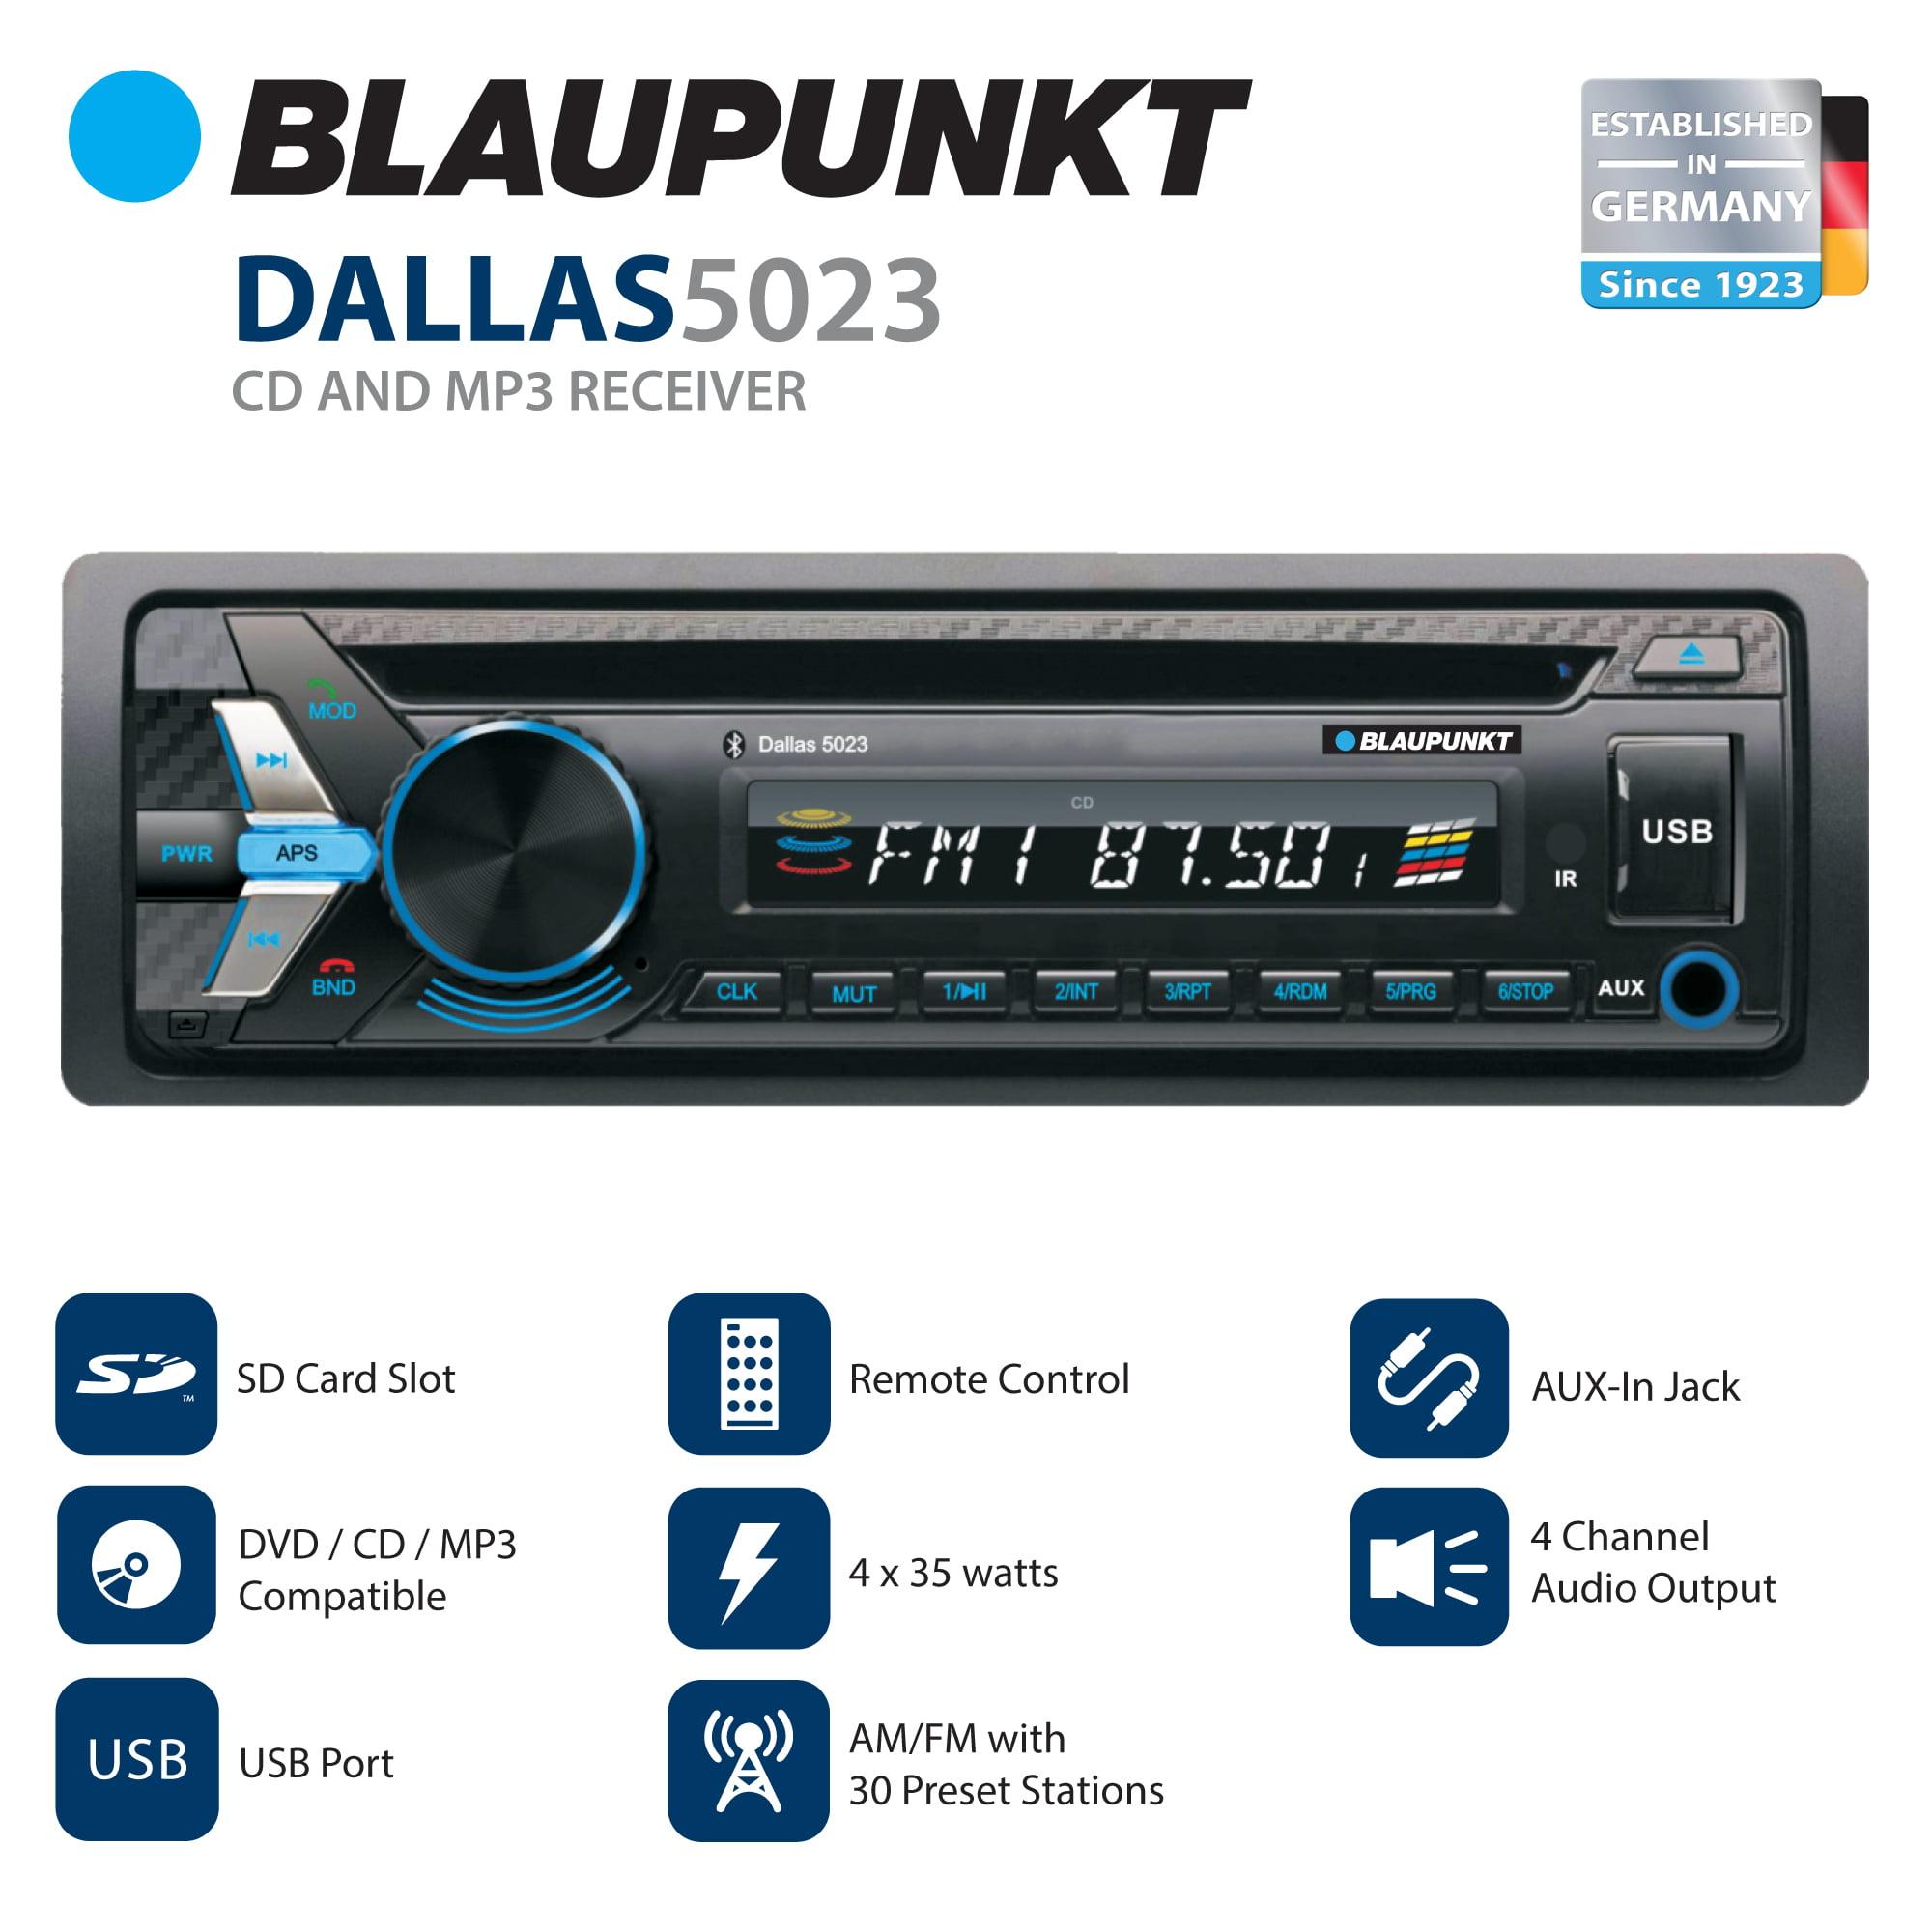 Blaupunkt Single Din Car Stereo CD and MP3 Receiver (DALLAS5023)